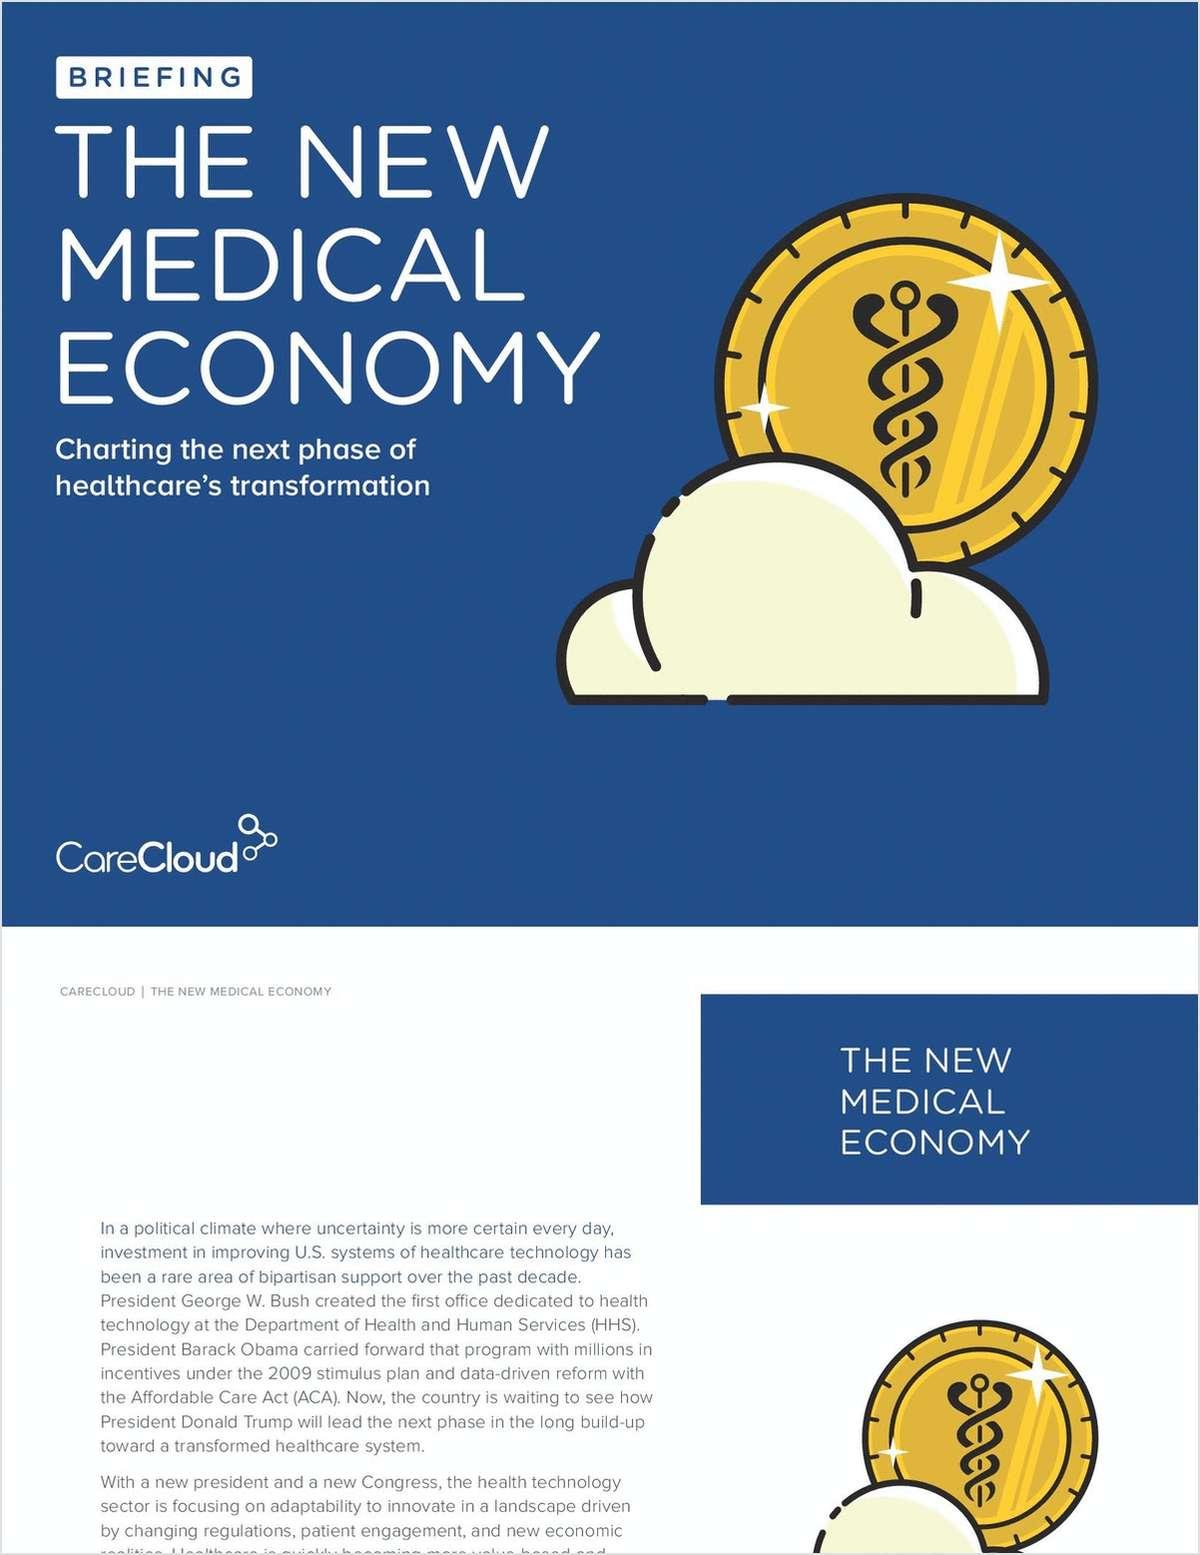 The New Medical Economy